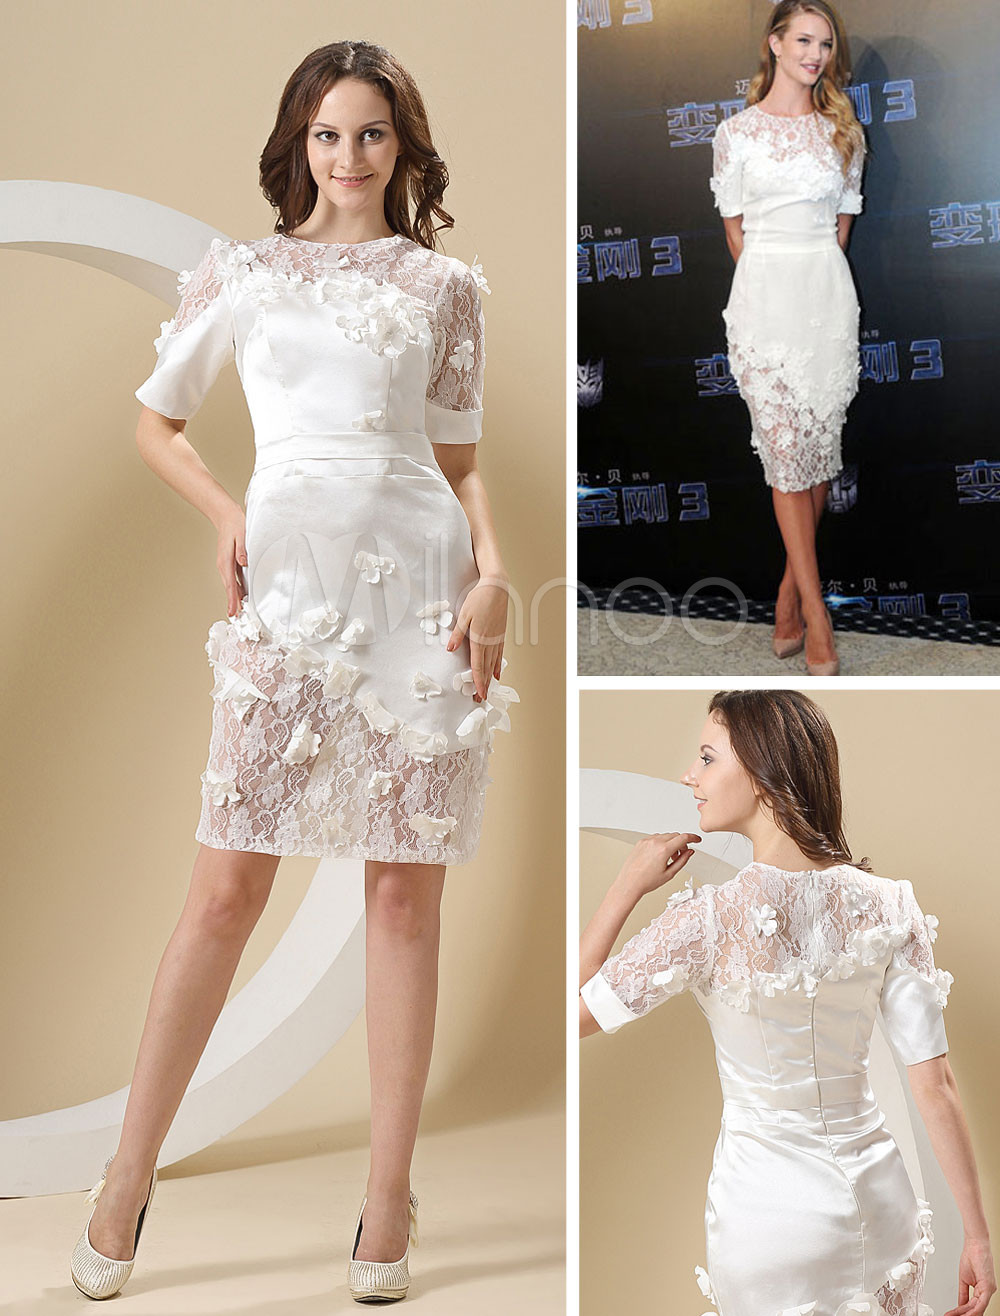 Pretty White Elastic Satin Round Neck Lace Ladies Gossip Girl Fashion Dress